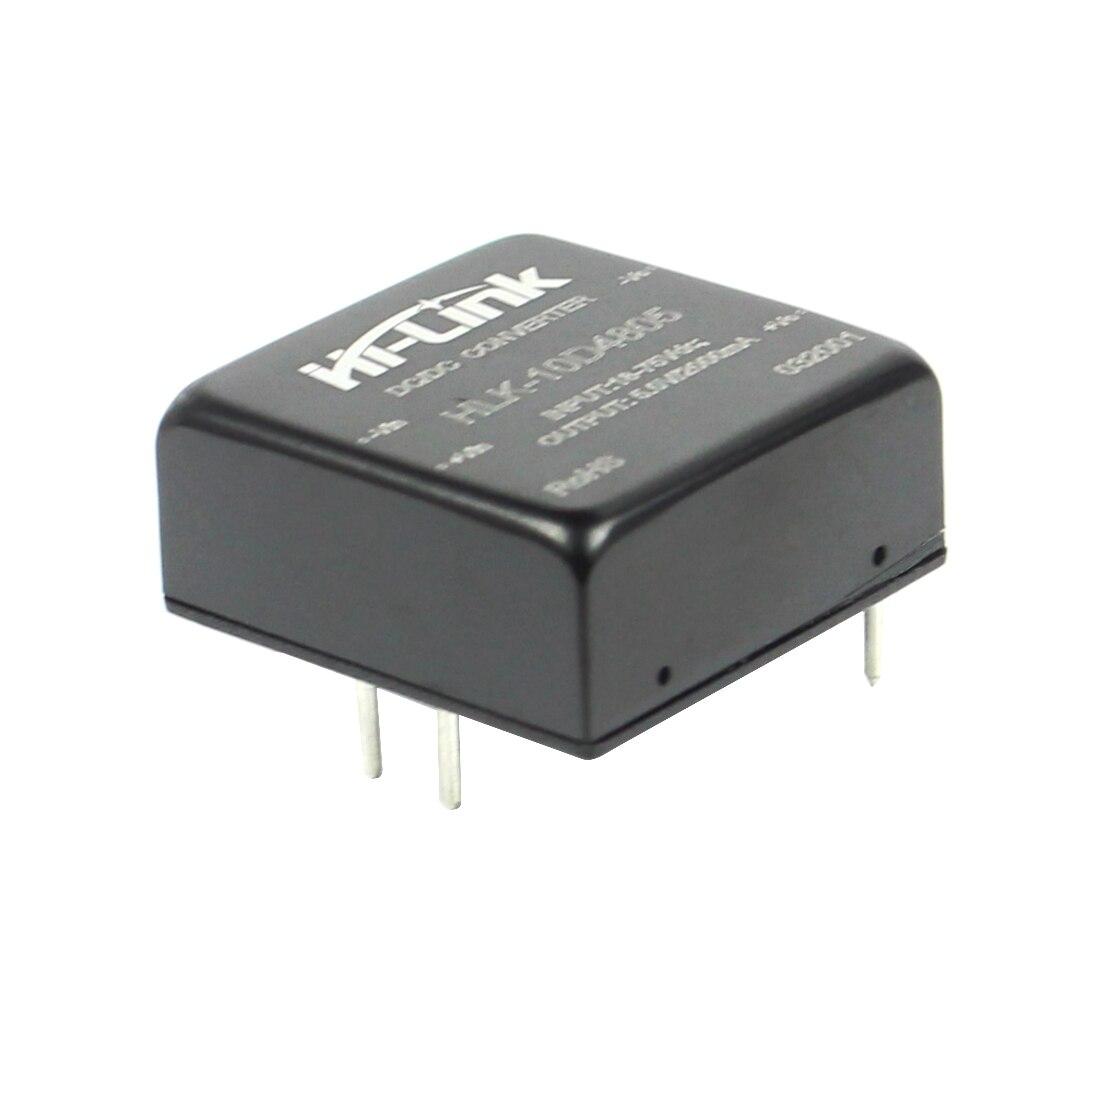 HLK-10D4805  5V/10W DC-DC Switch Power Supply Module